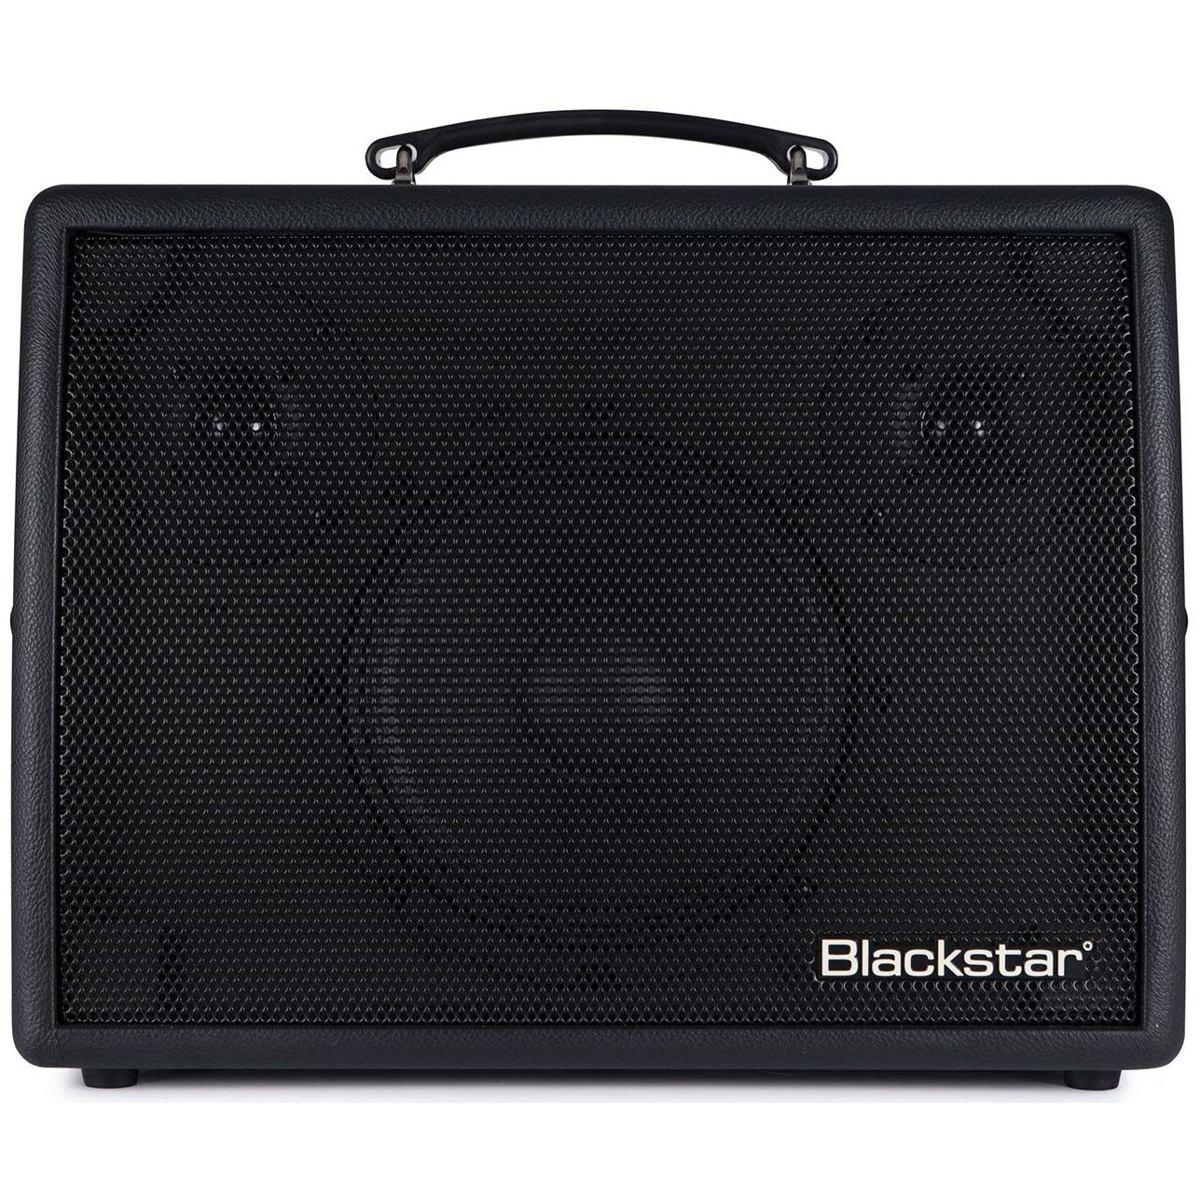 Blackstar SONNET 120 Barva: Black